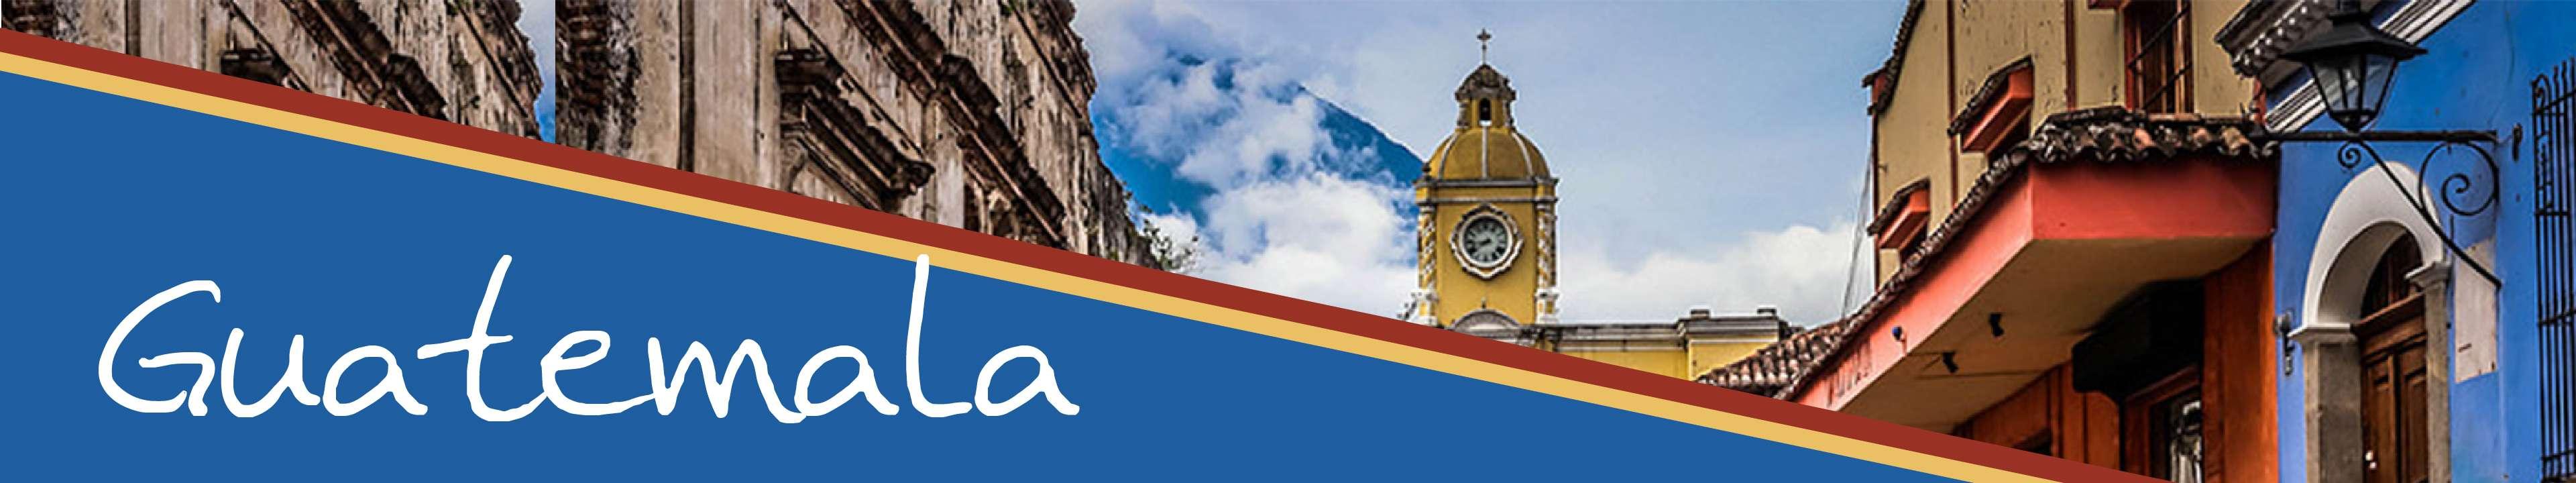 guatemala-mission-trip-7brd-dq2020-slim-banner